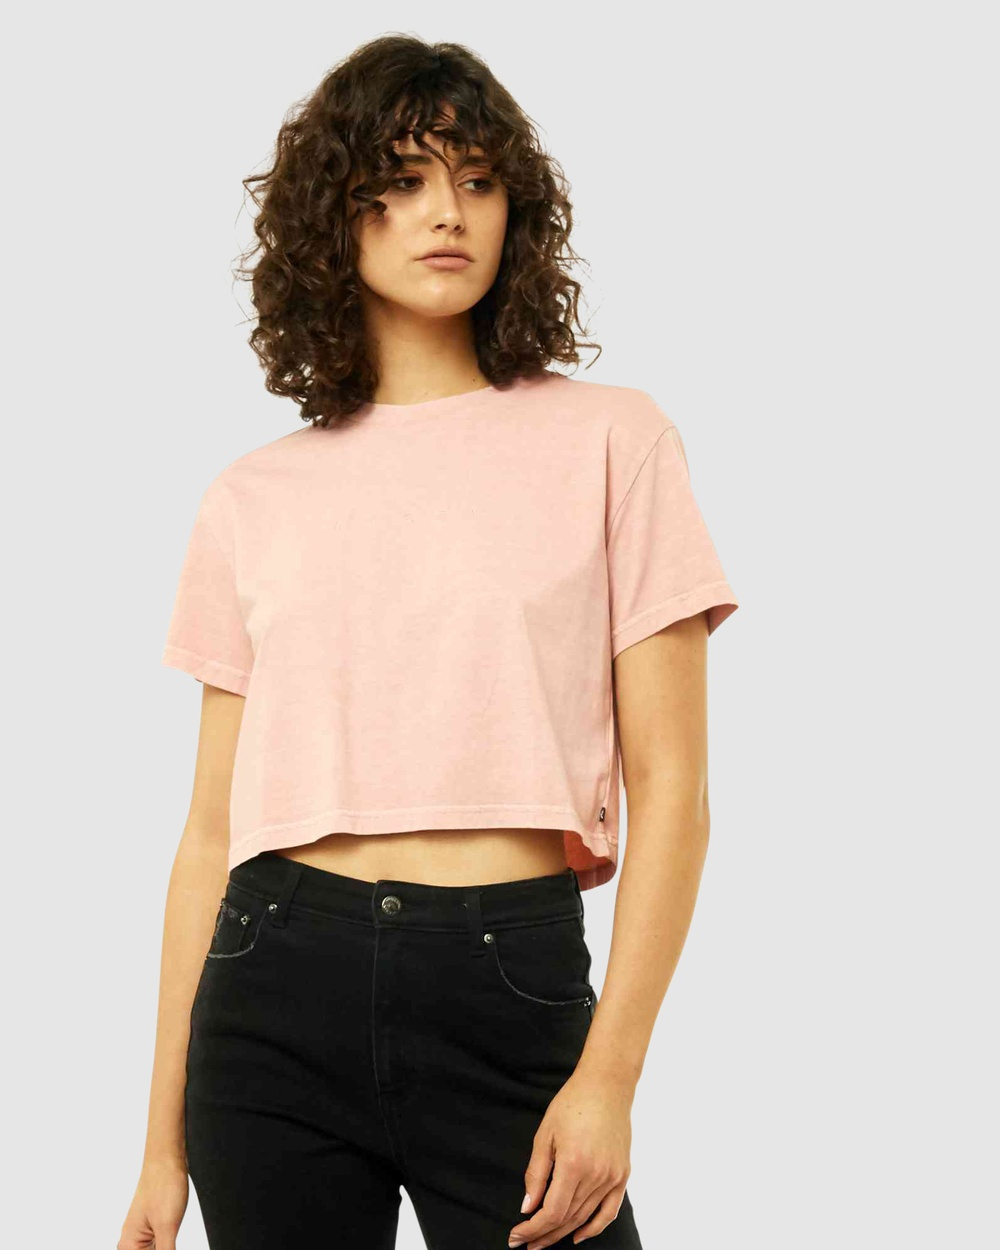 Rusty Essentials Ember Crop Tee Short Sleeve T-Shirts RSC Australia